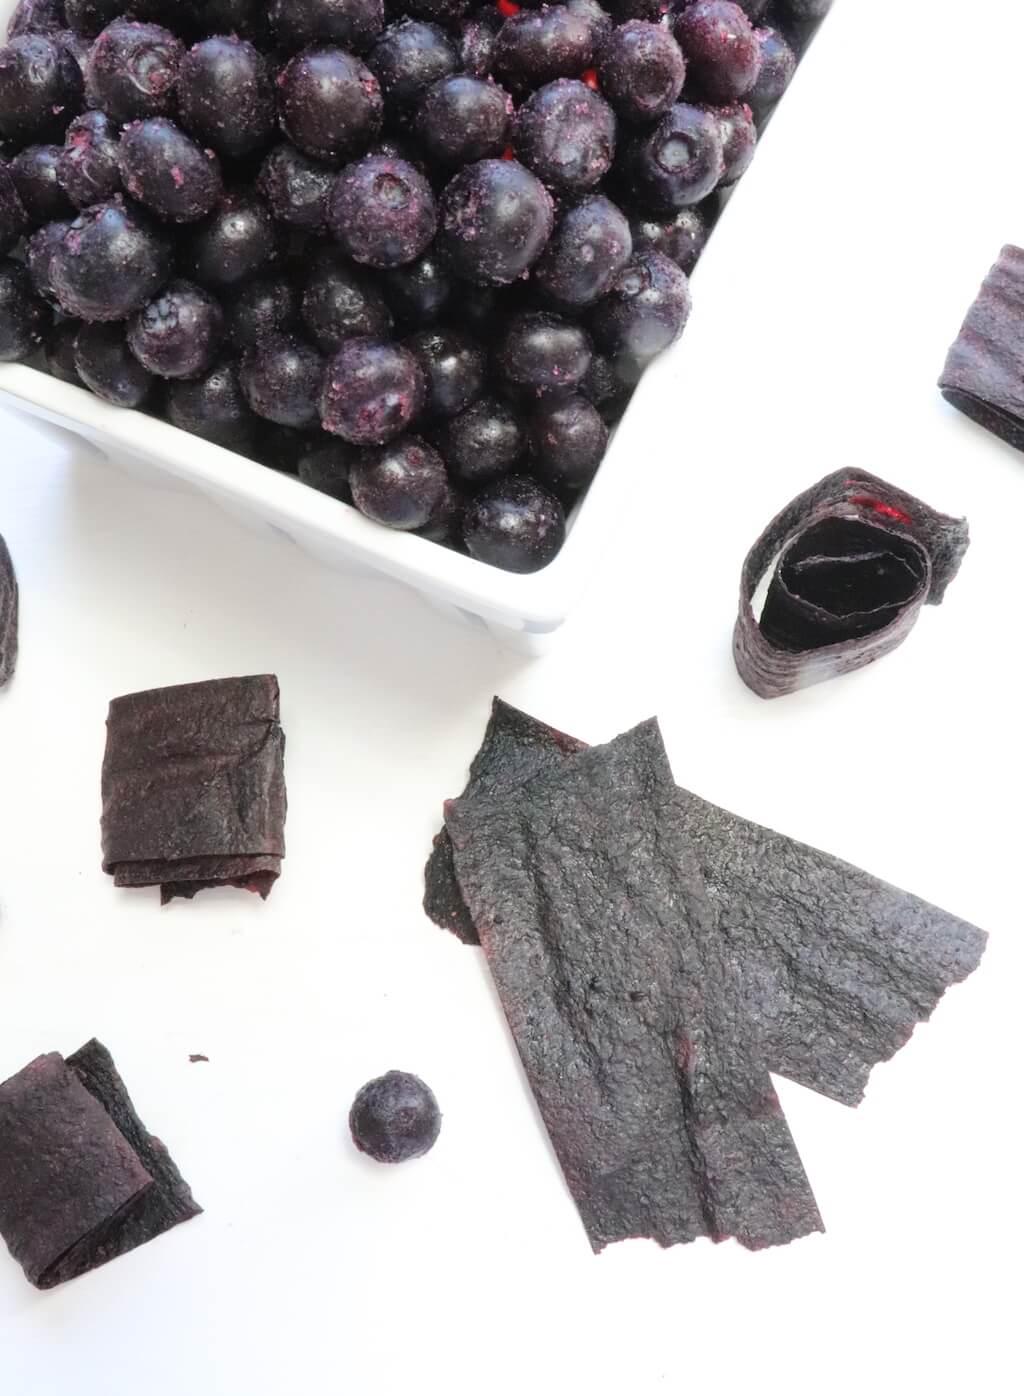 Naturipe Berry Fruit Leather